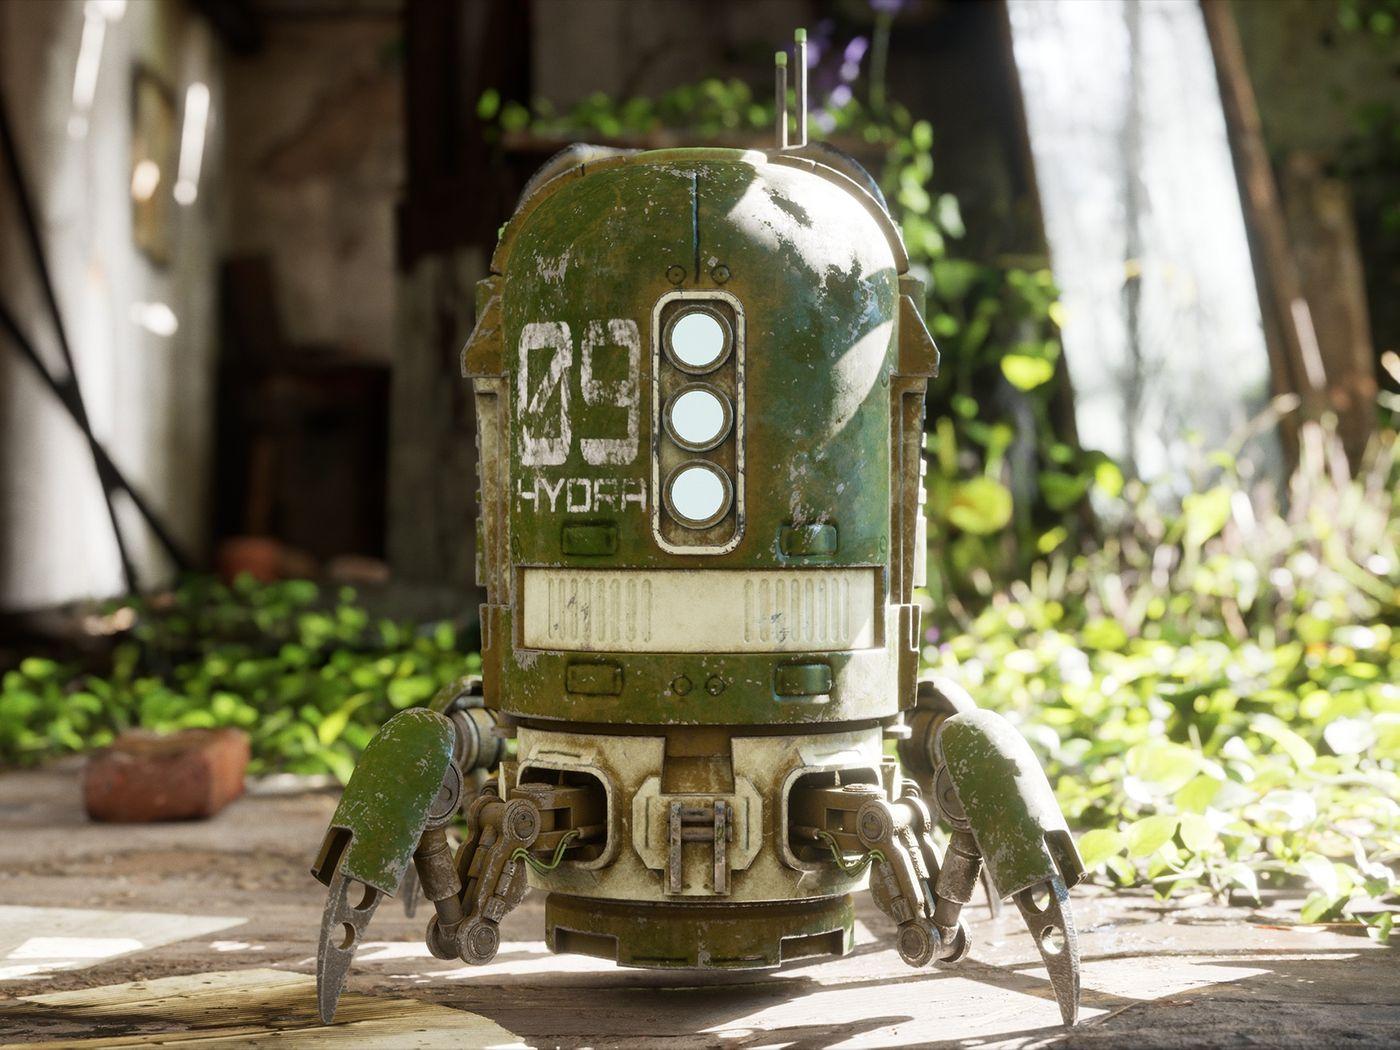 Spider Robot | Game ready